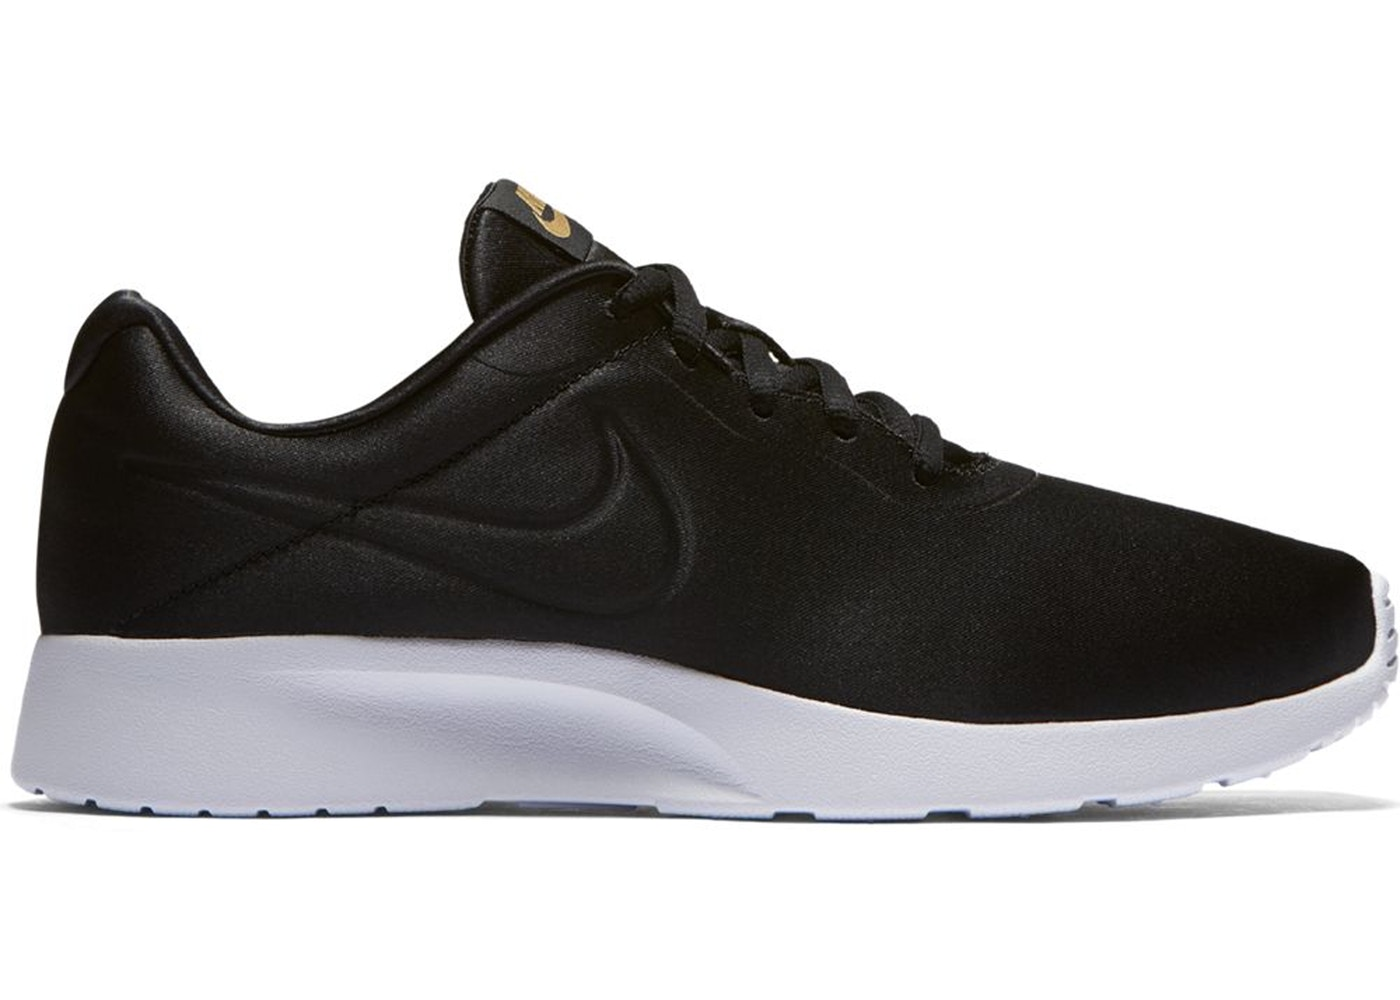 Nike Tanjun Premium Black Satin (W) - 917537-003